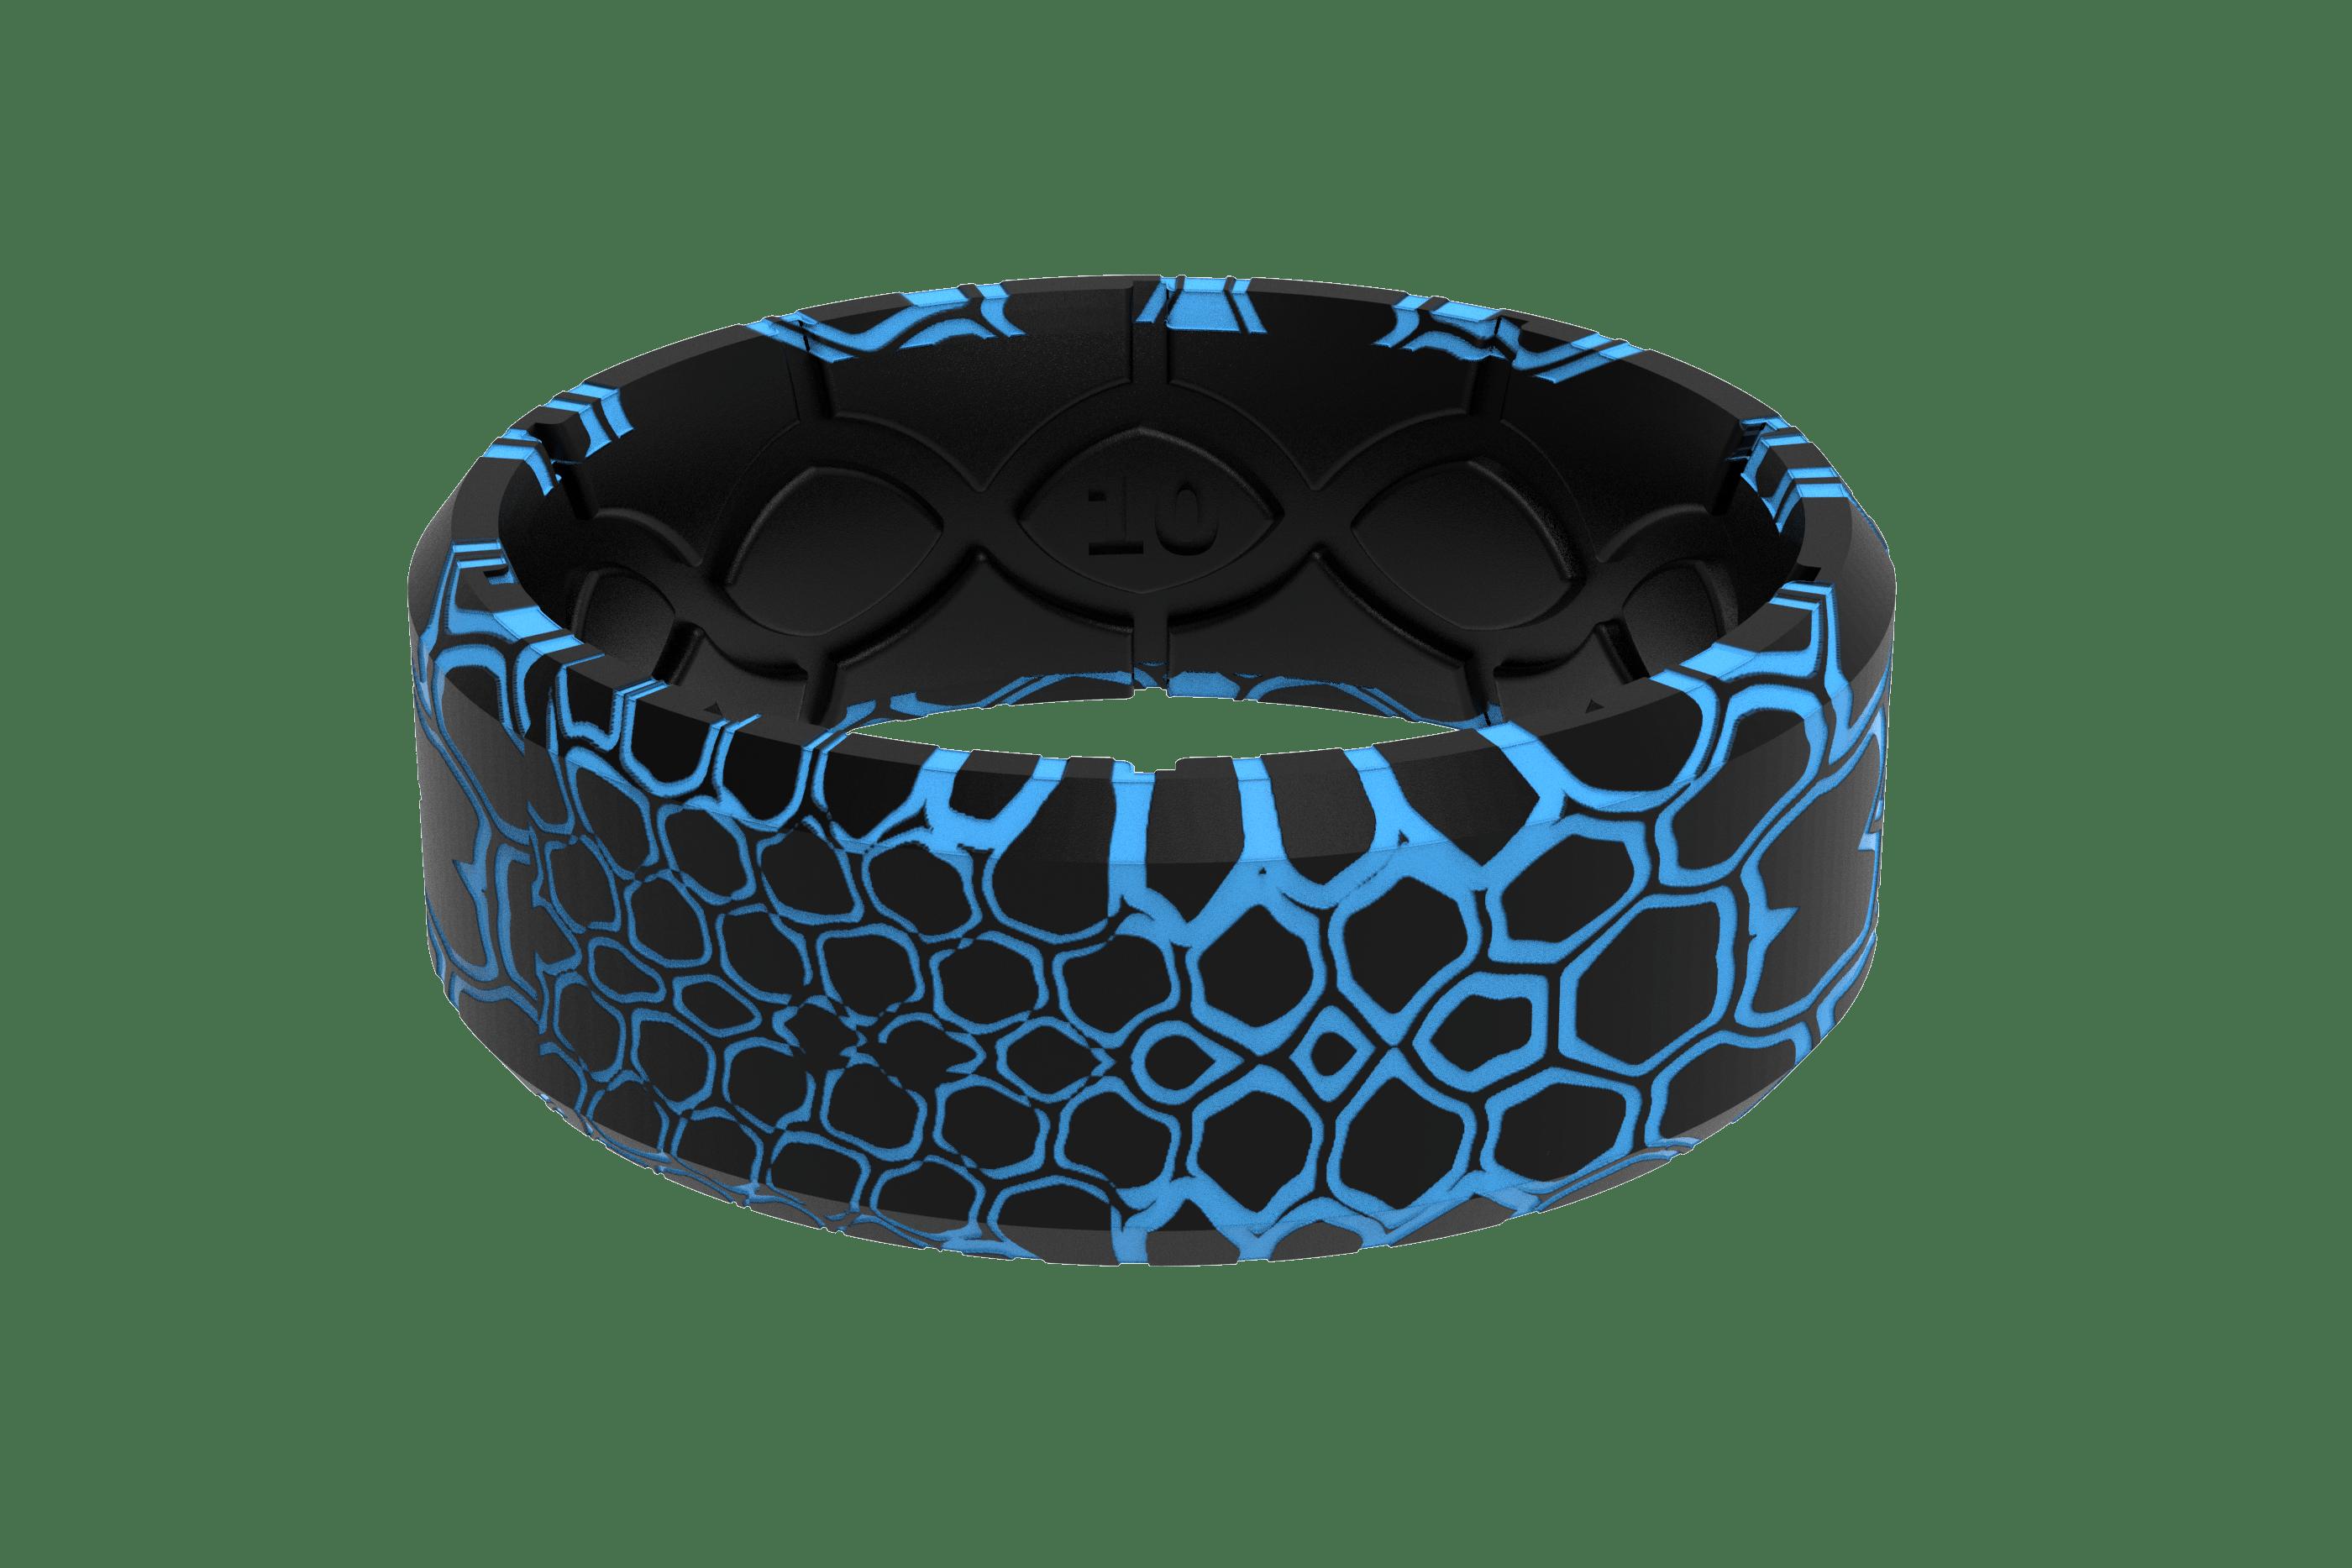 Kryptek Pontus 3D Camo Ring viewed from front